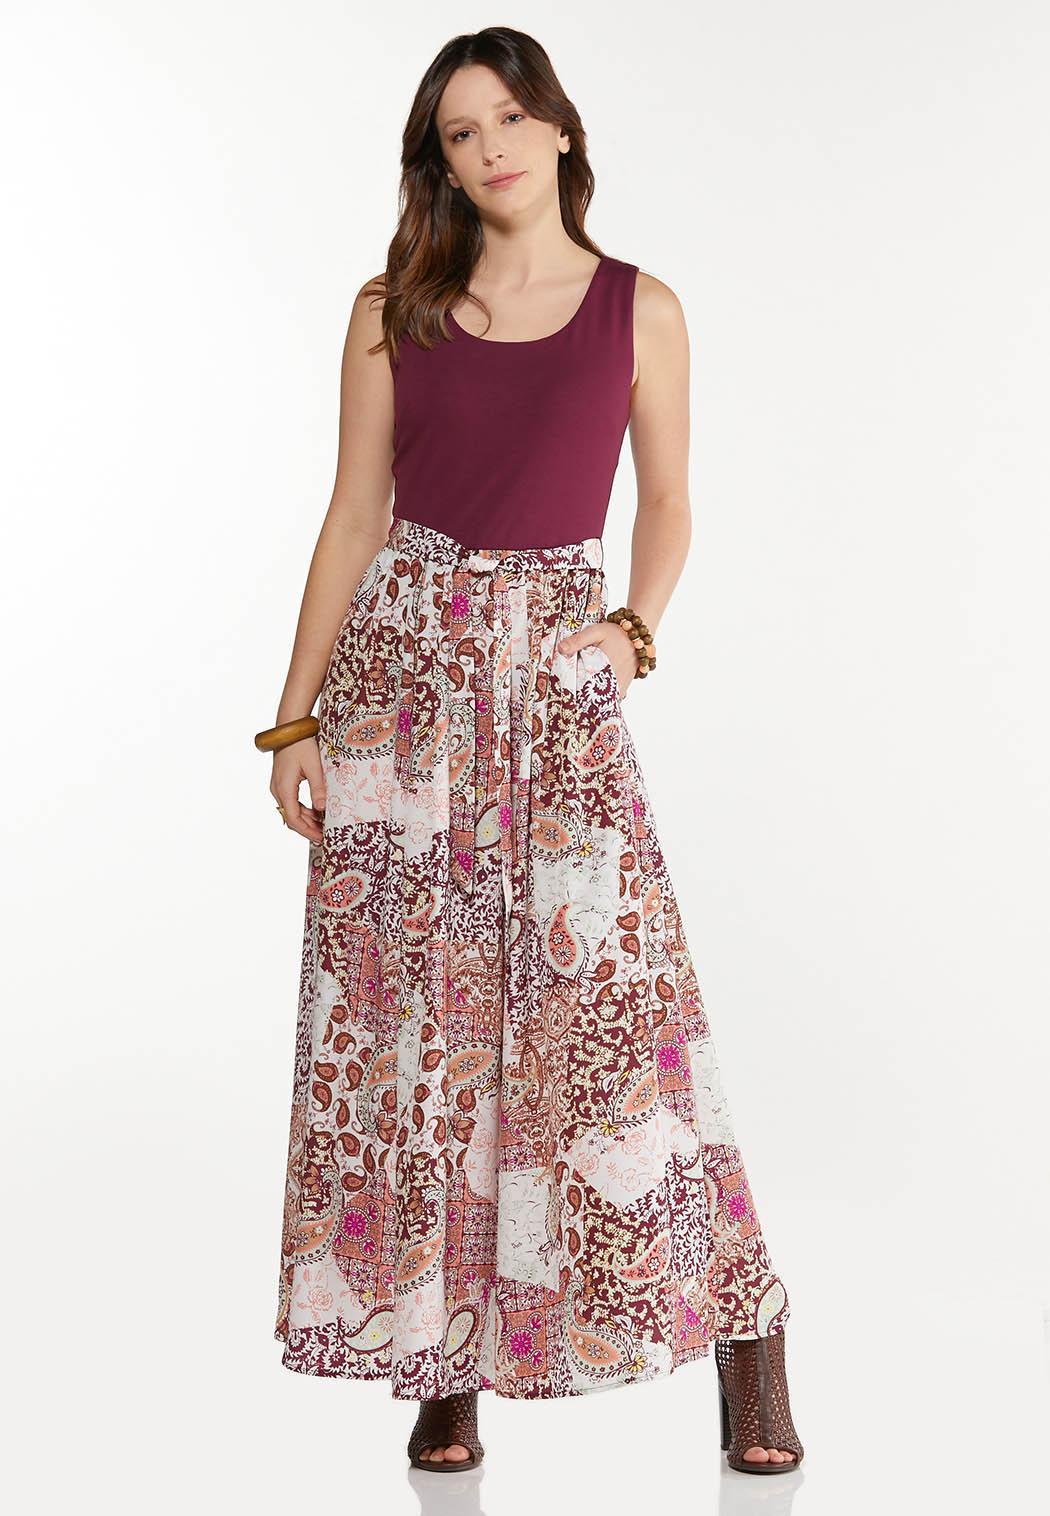 Patchwork Paisley Maxi Dress